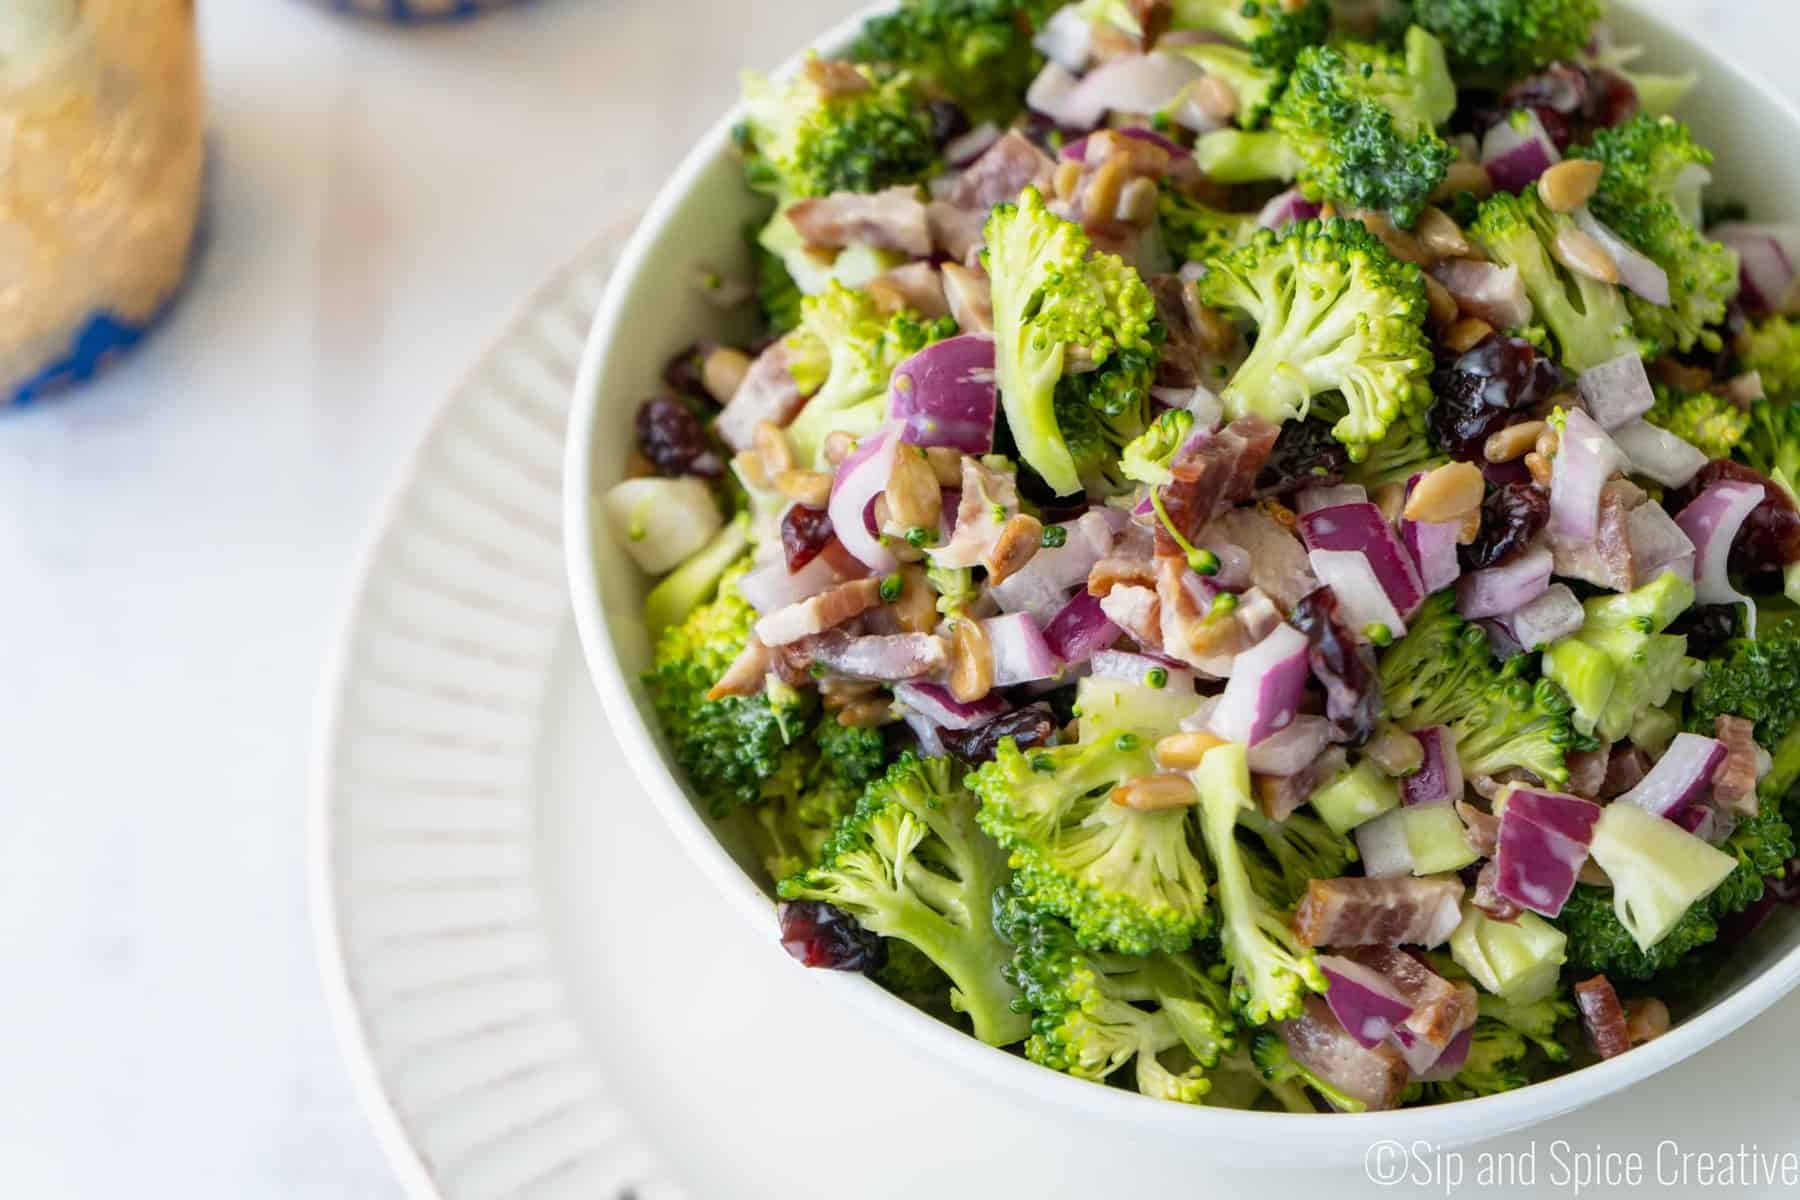 Broccoli Salad with Bacon and Greek Yogurt Dressing